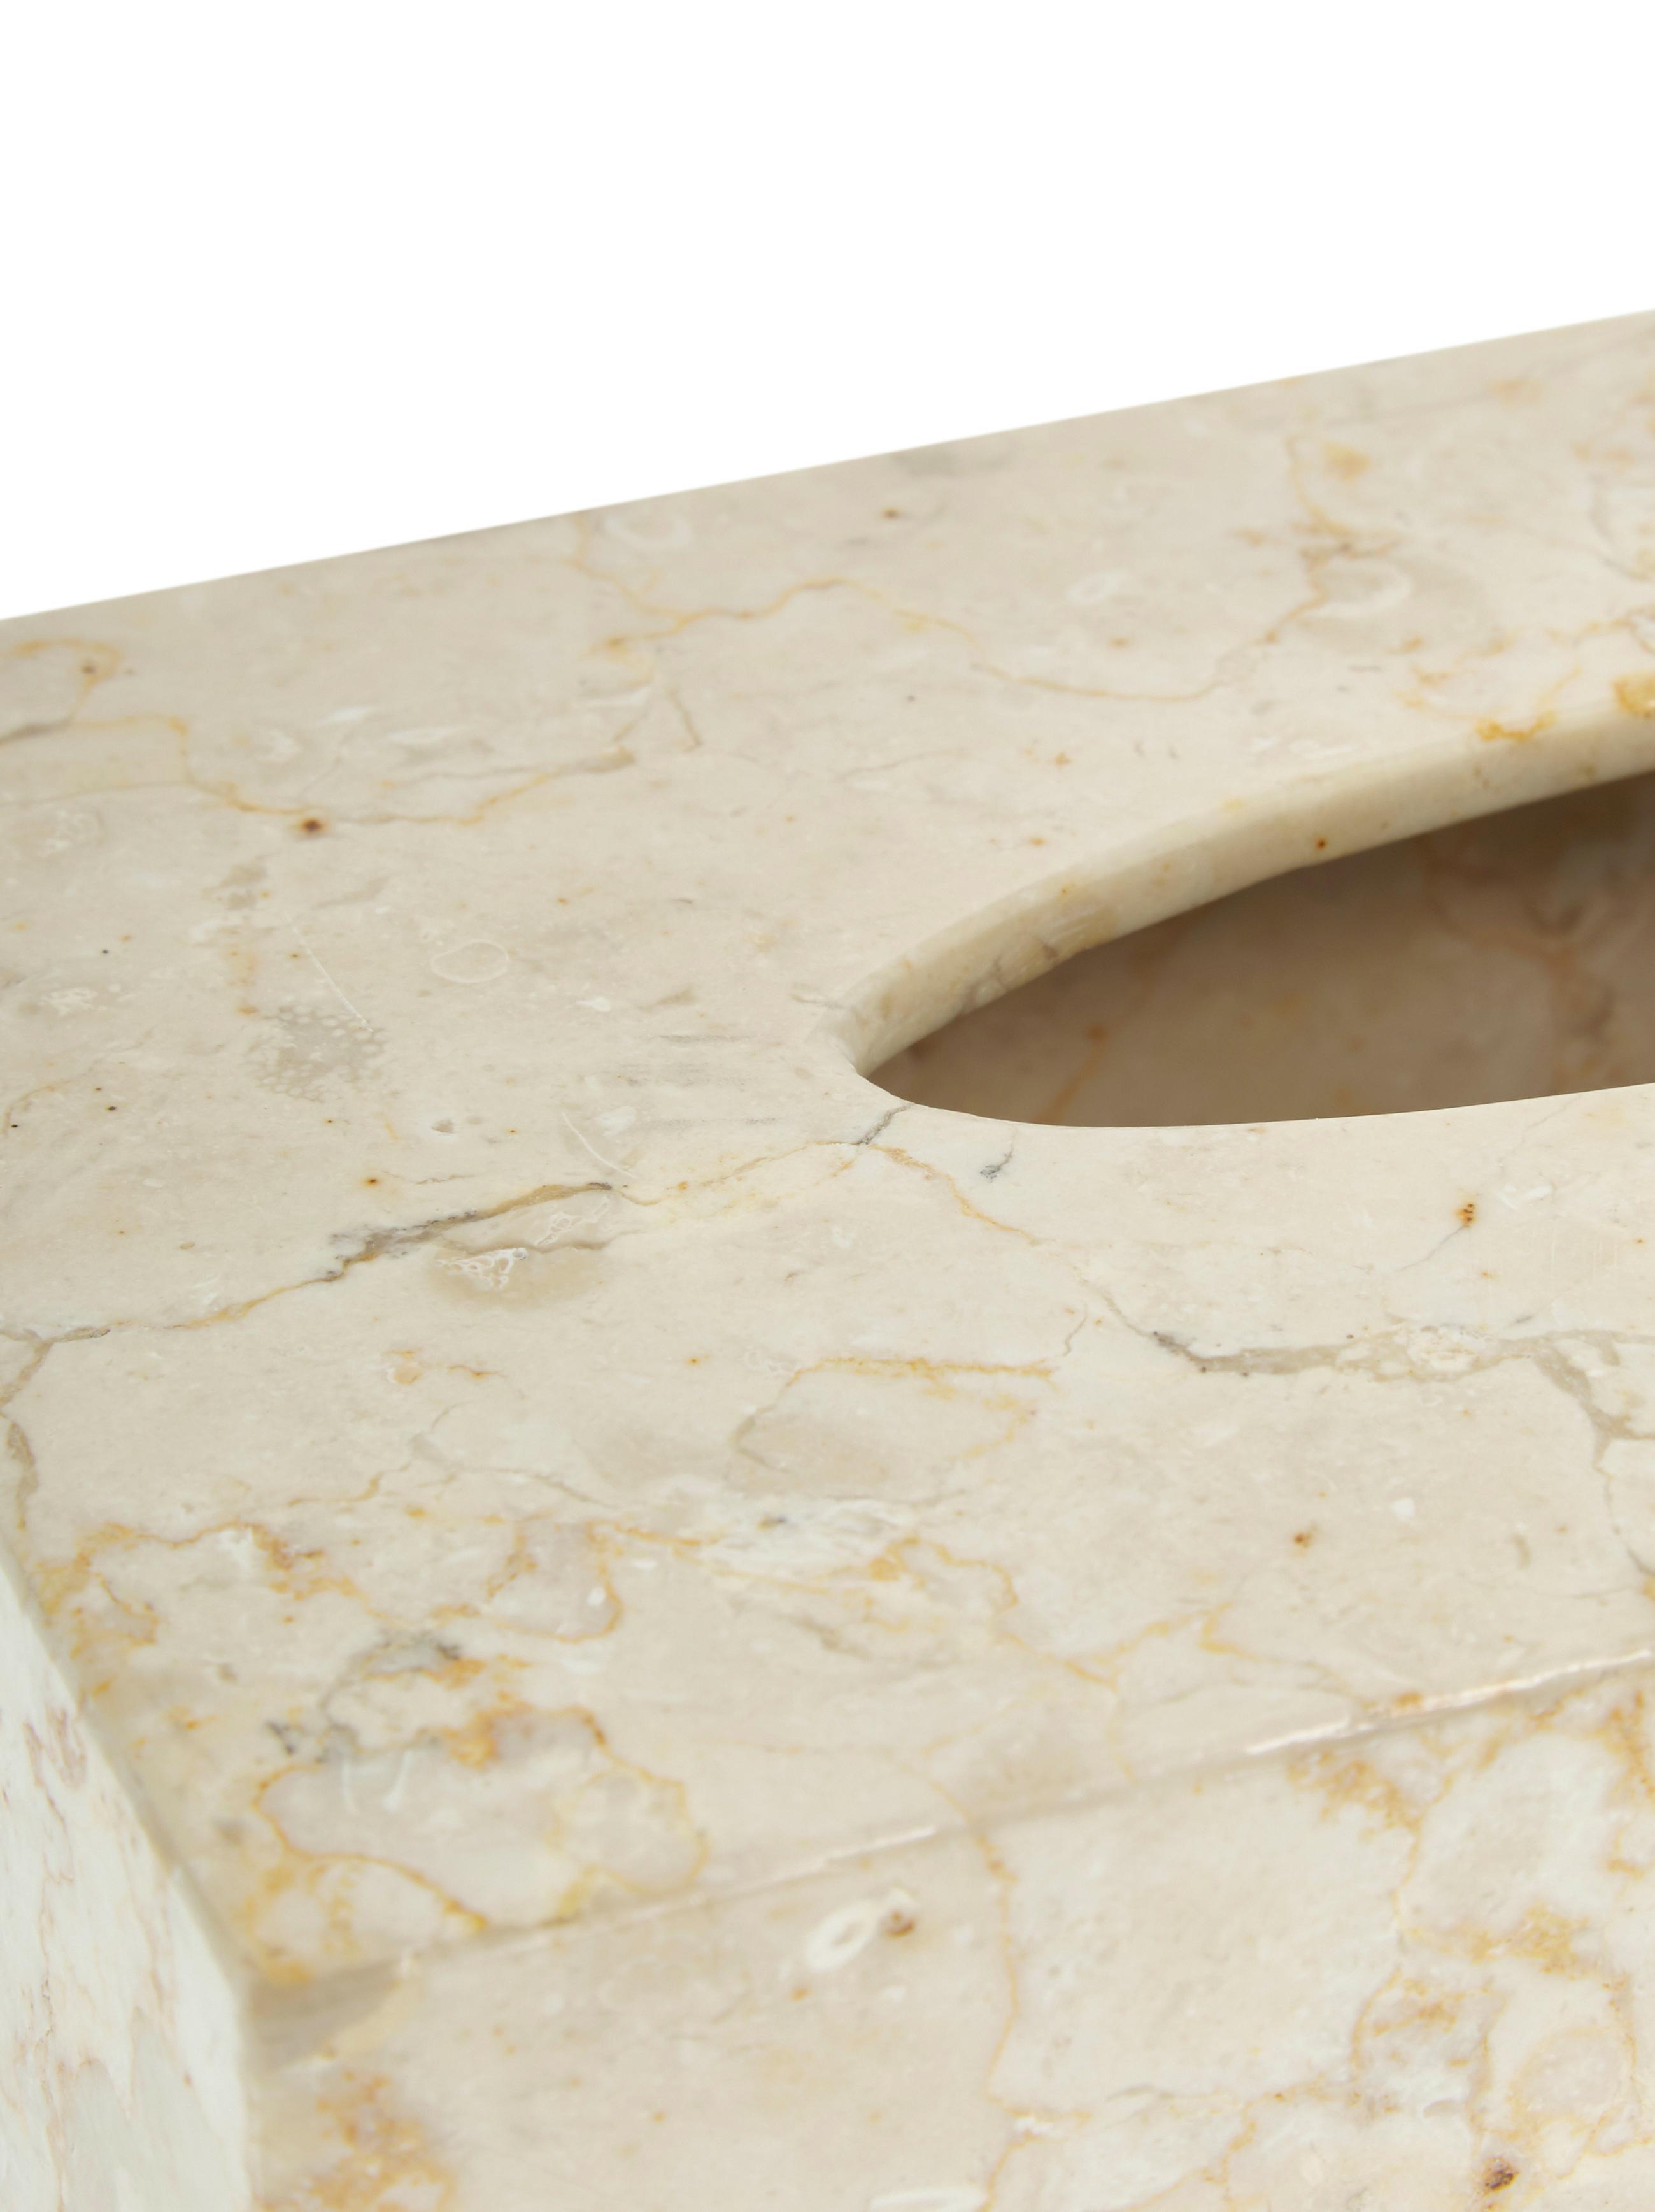 Marmor-Kosmetiktuchbox Luxor, Marmor, Beige, 26 x 8 cm